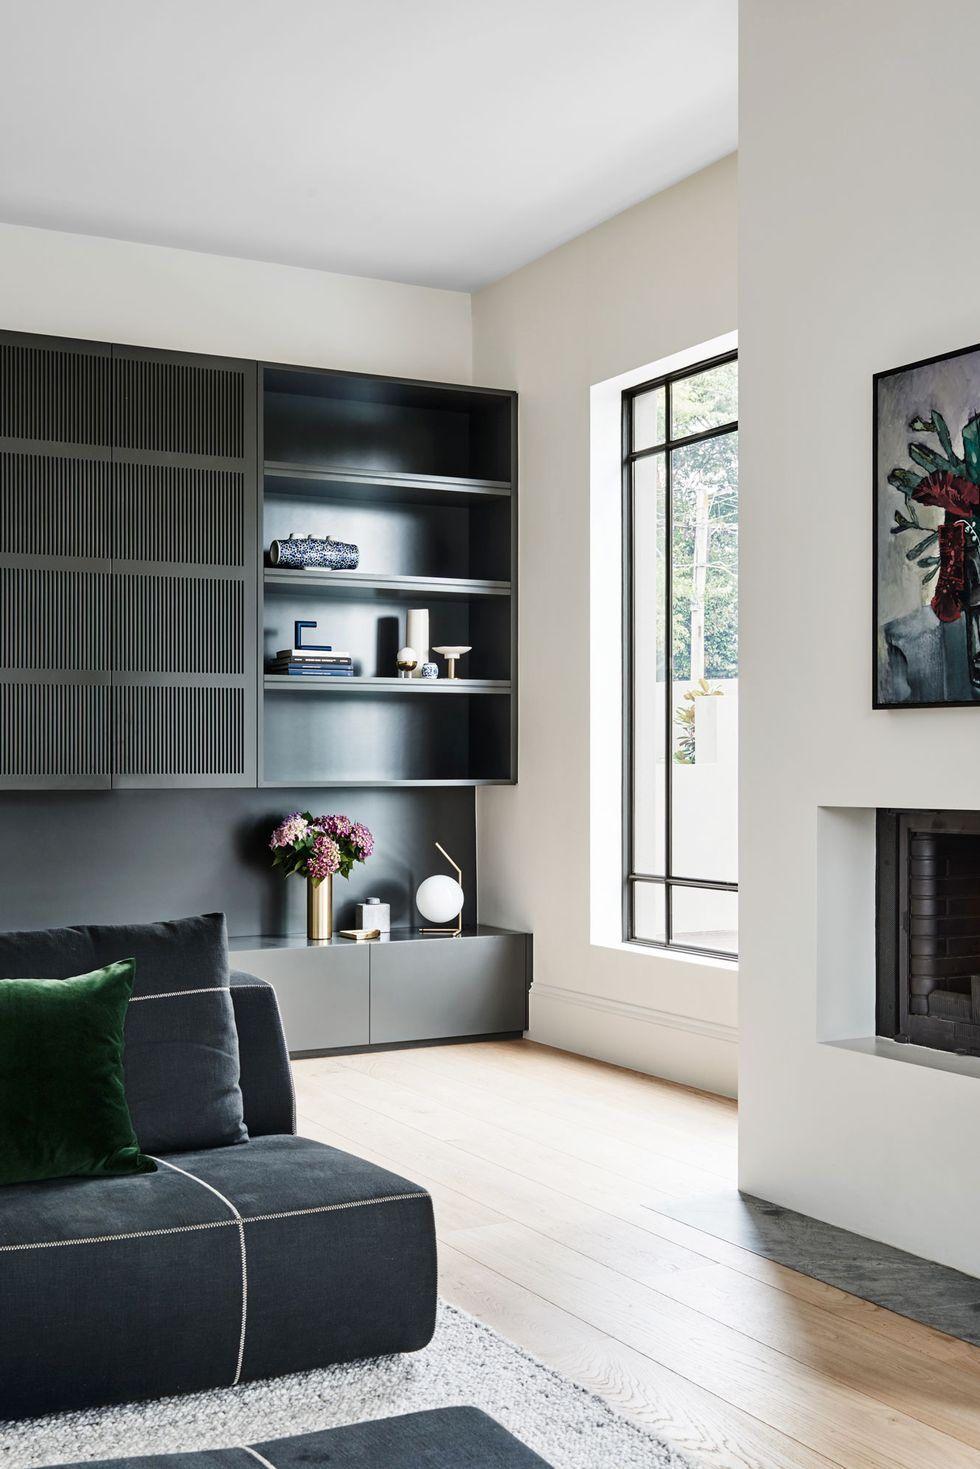 eb756379eef458932b3264b8f052fbbf - 32+ Living Room Minimalist House Interior Design Pics